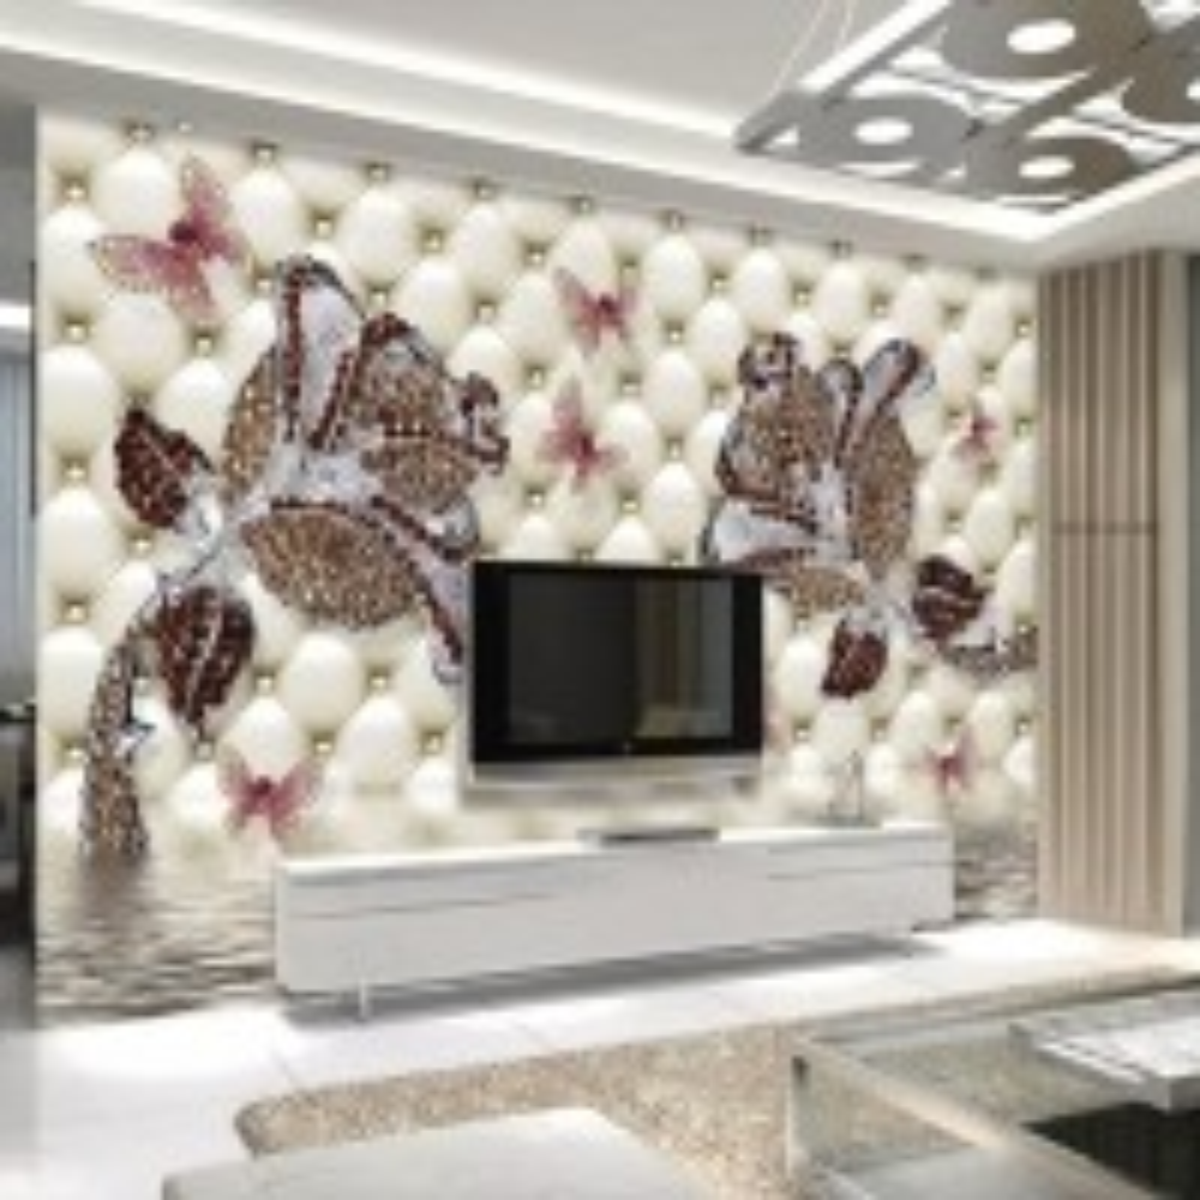 Brown Diamond Roses and Butterflies Wallpaper Mural